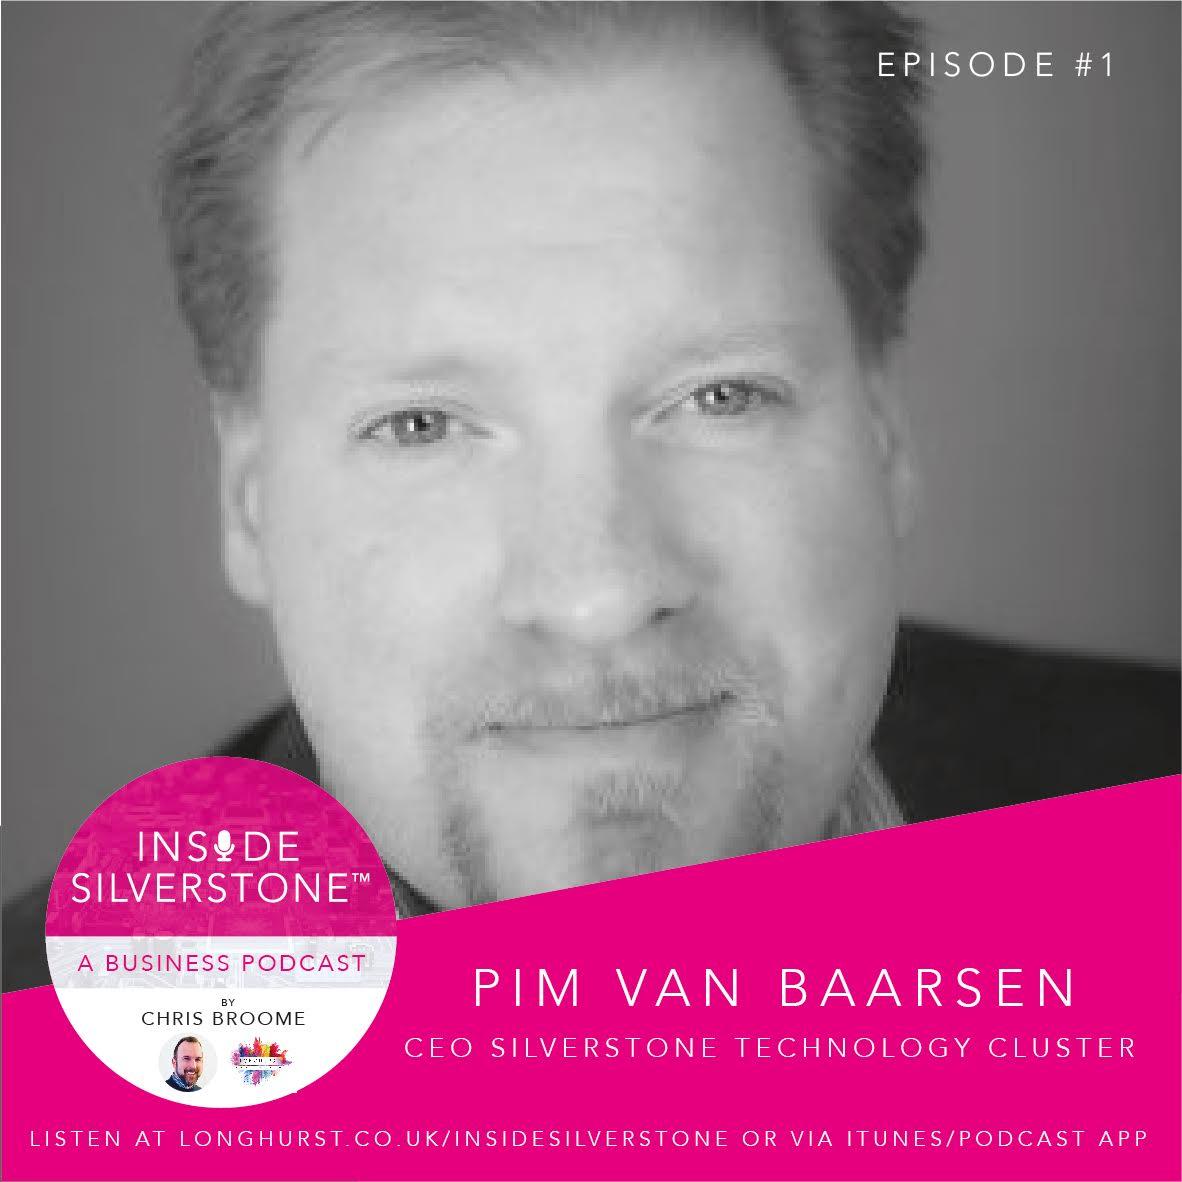 Pim van Baarsen, CEO of the Silverstone Technology Cluster